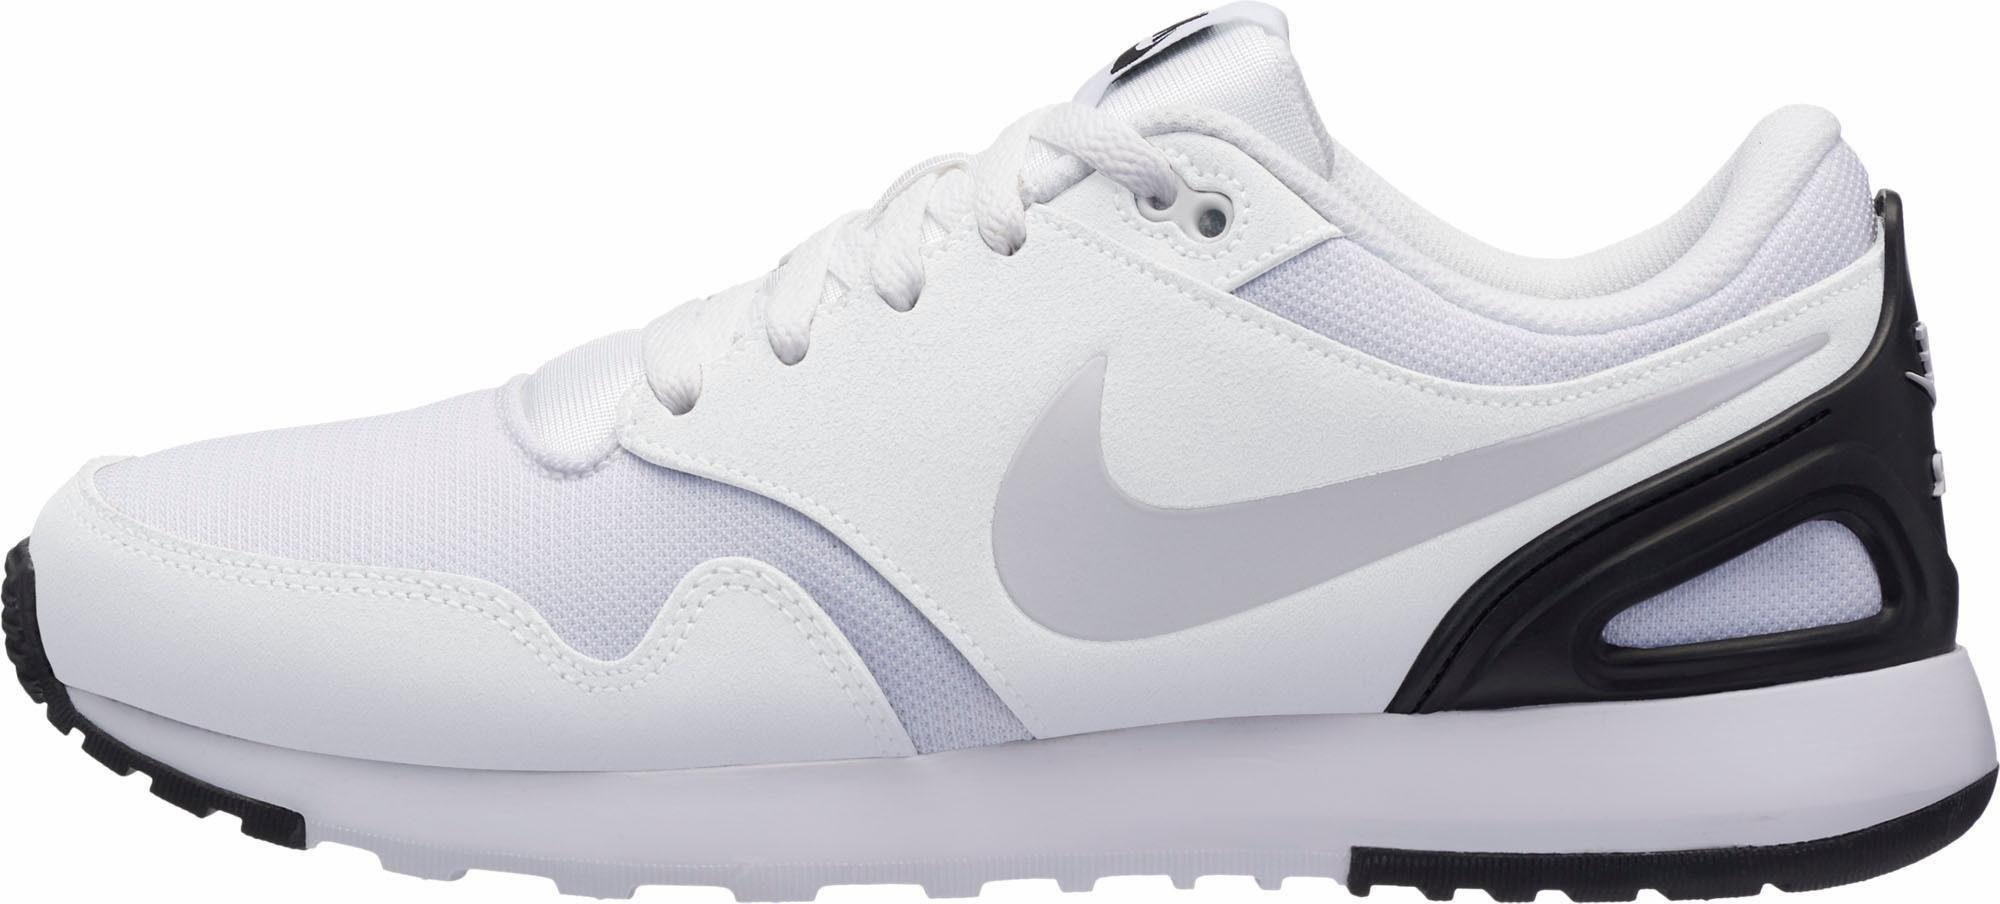 Nike Sportswear »Air Vibenna« Sneaker | Schuhe Kids in 2019